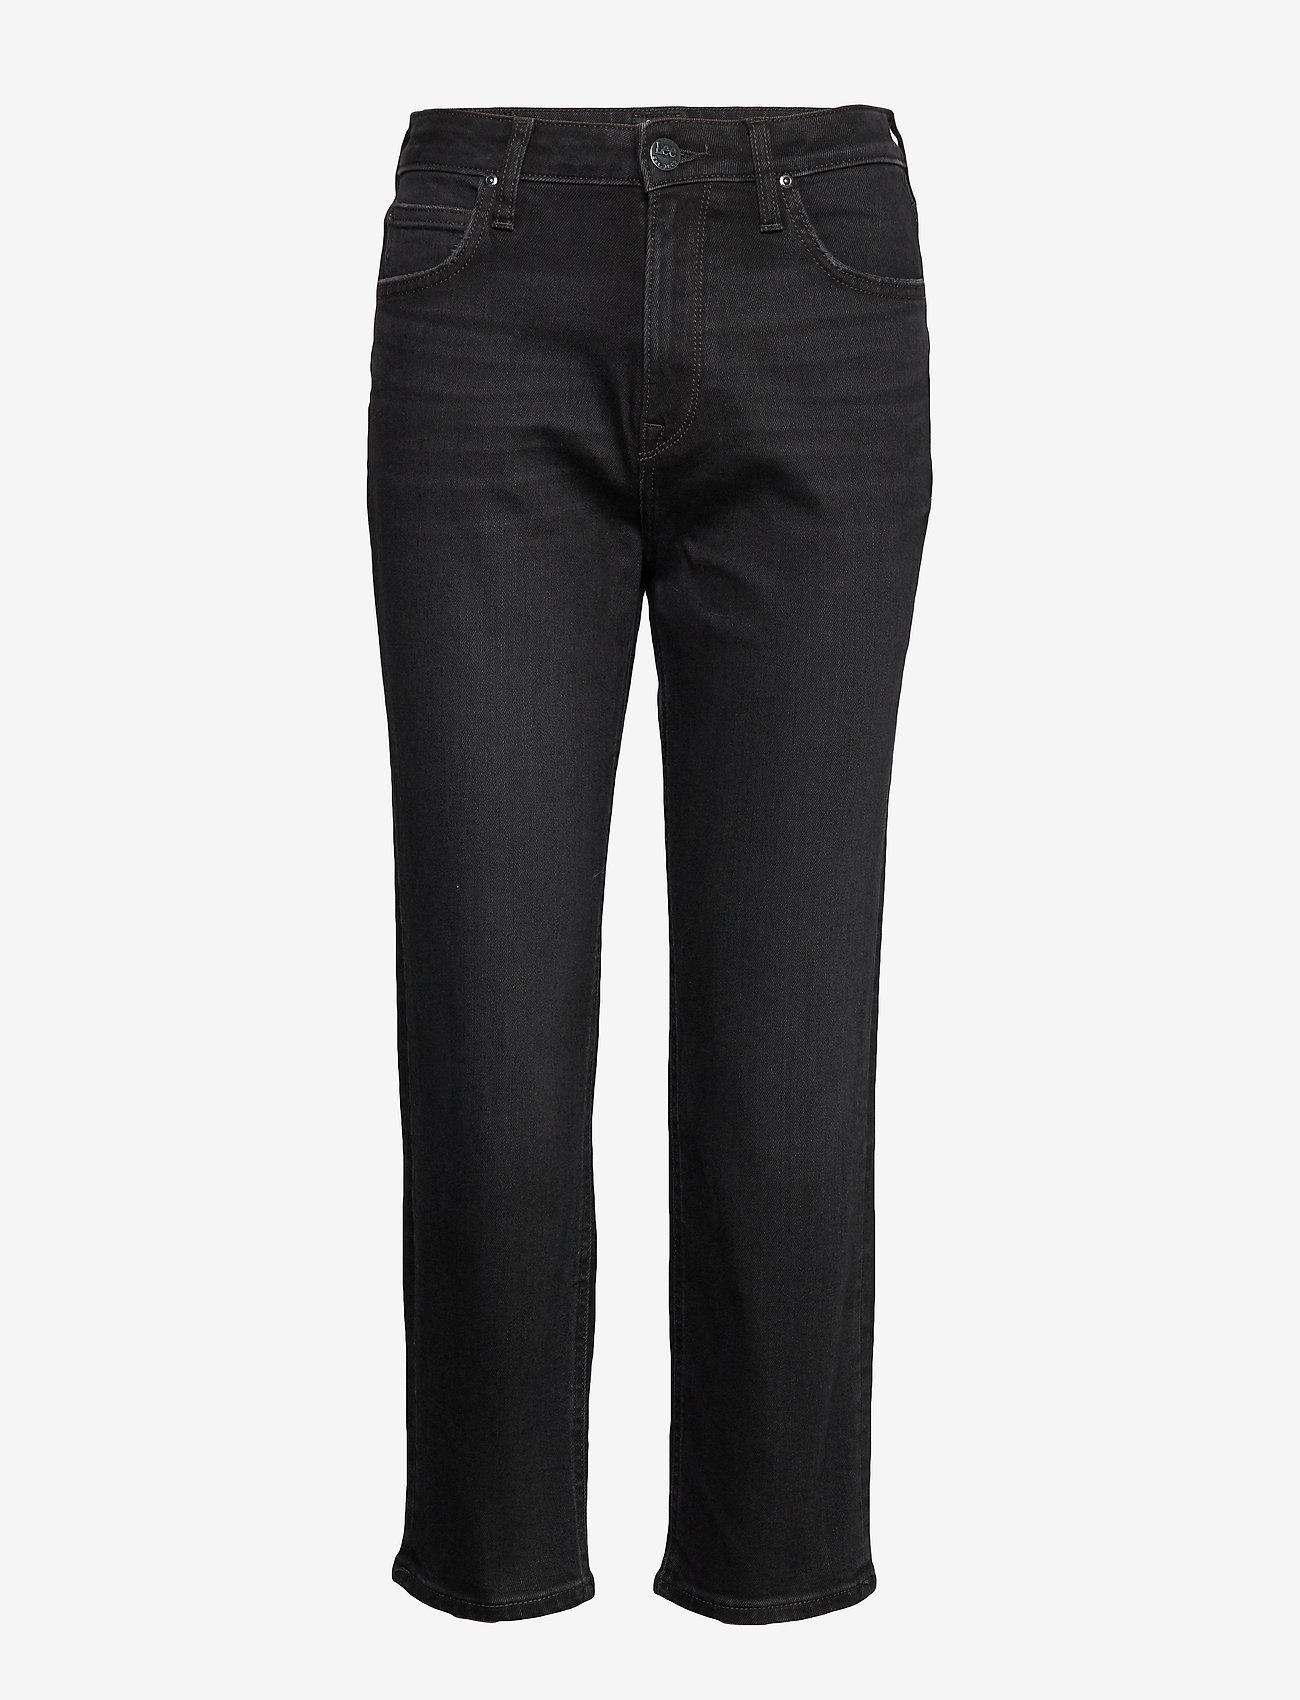 Lee Jeans - CAROL - straight jeans - black worn - 0